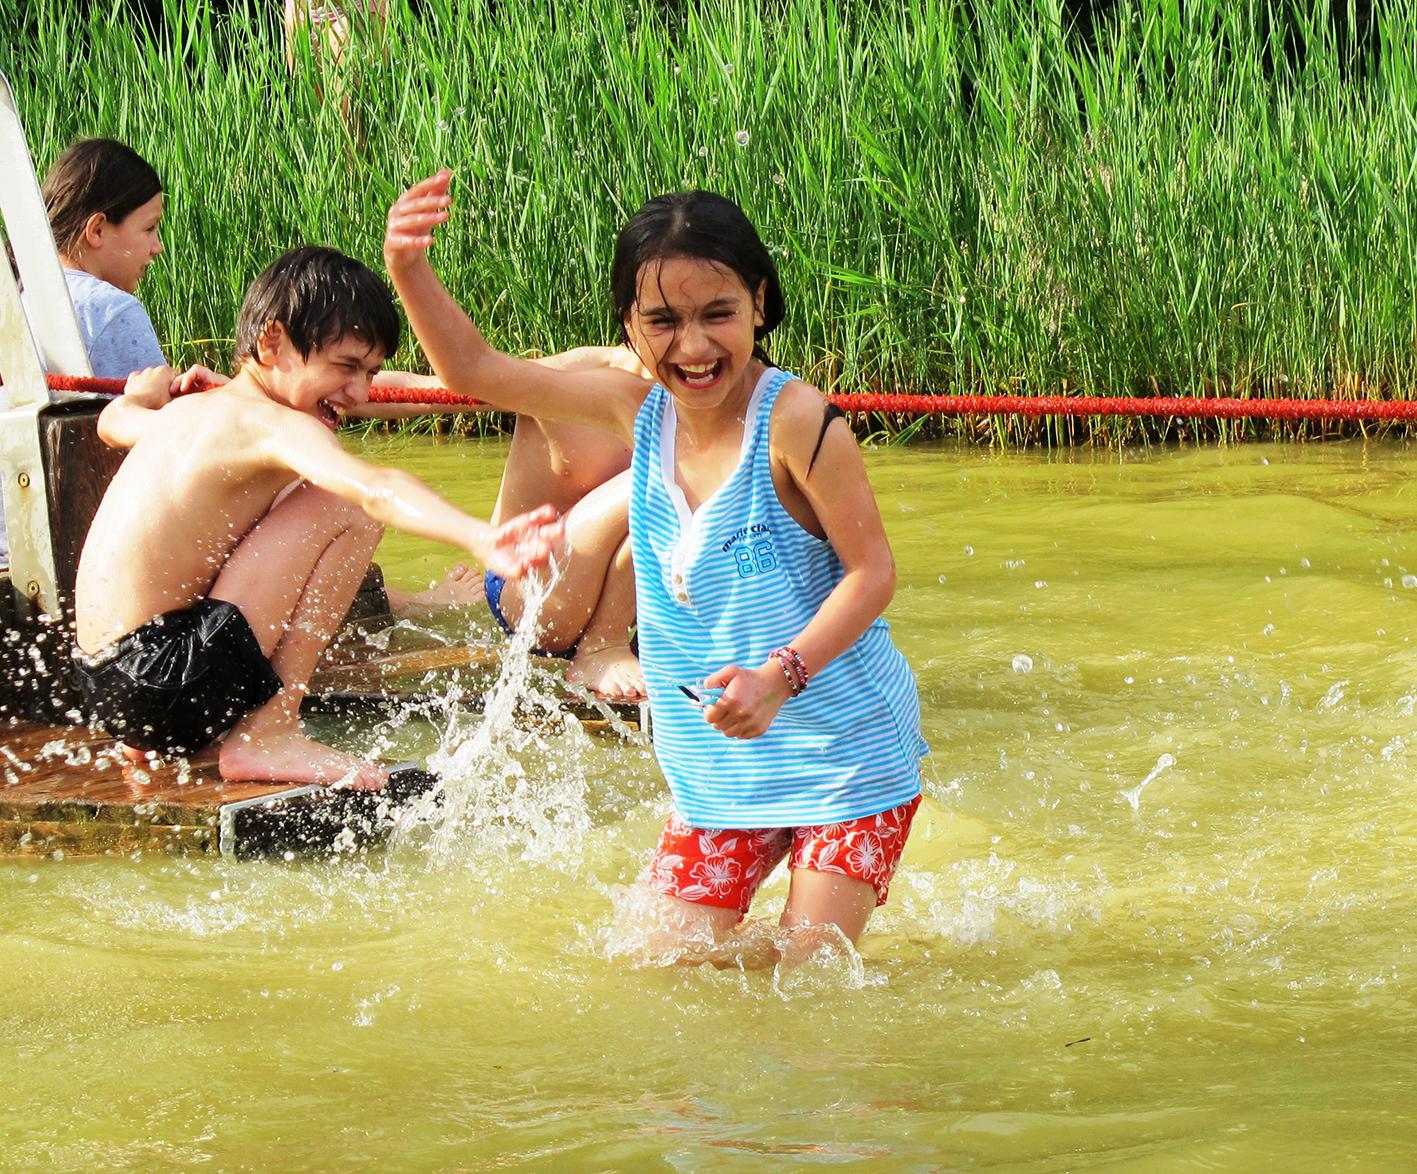 Wasserspielplatz, Kinderflüchtlingsprojekt LIMDA, Foto: © Tina Handl